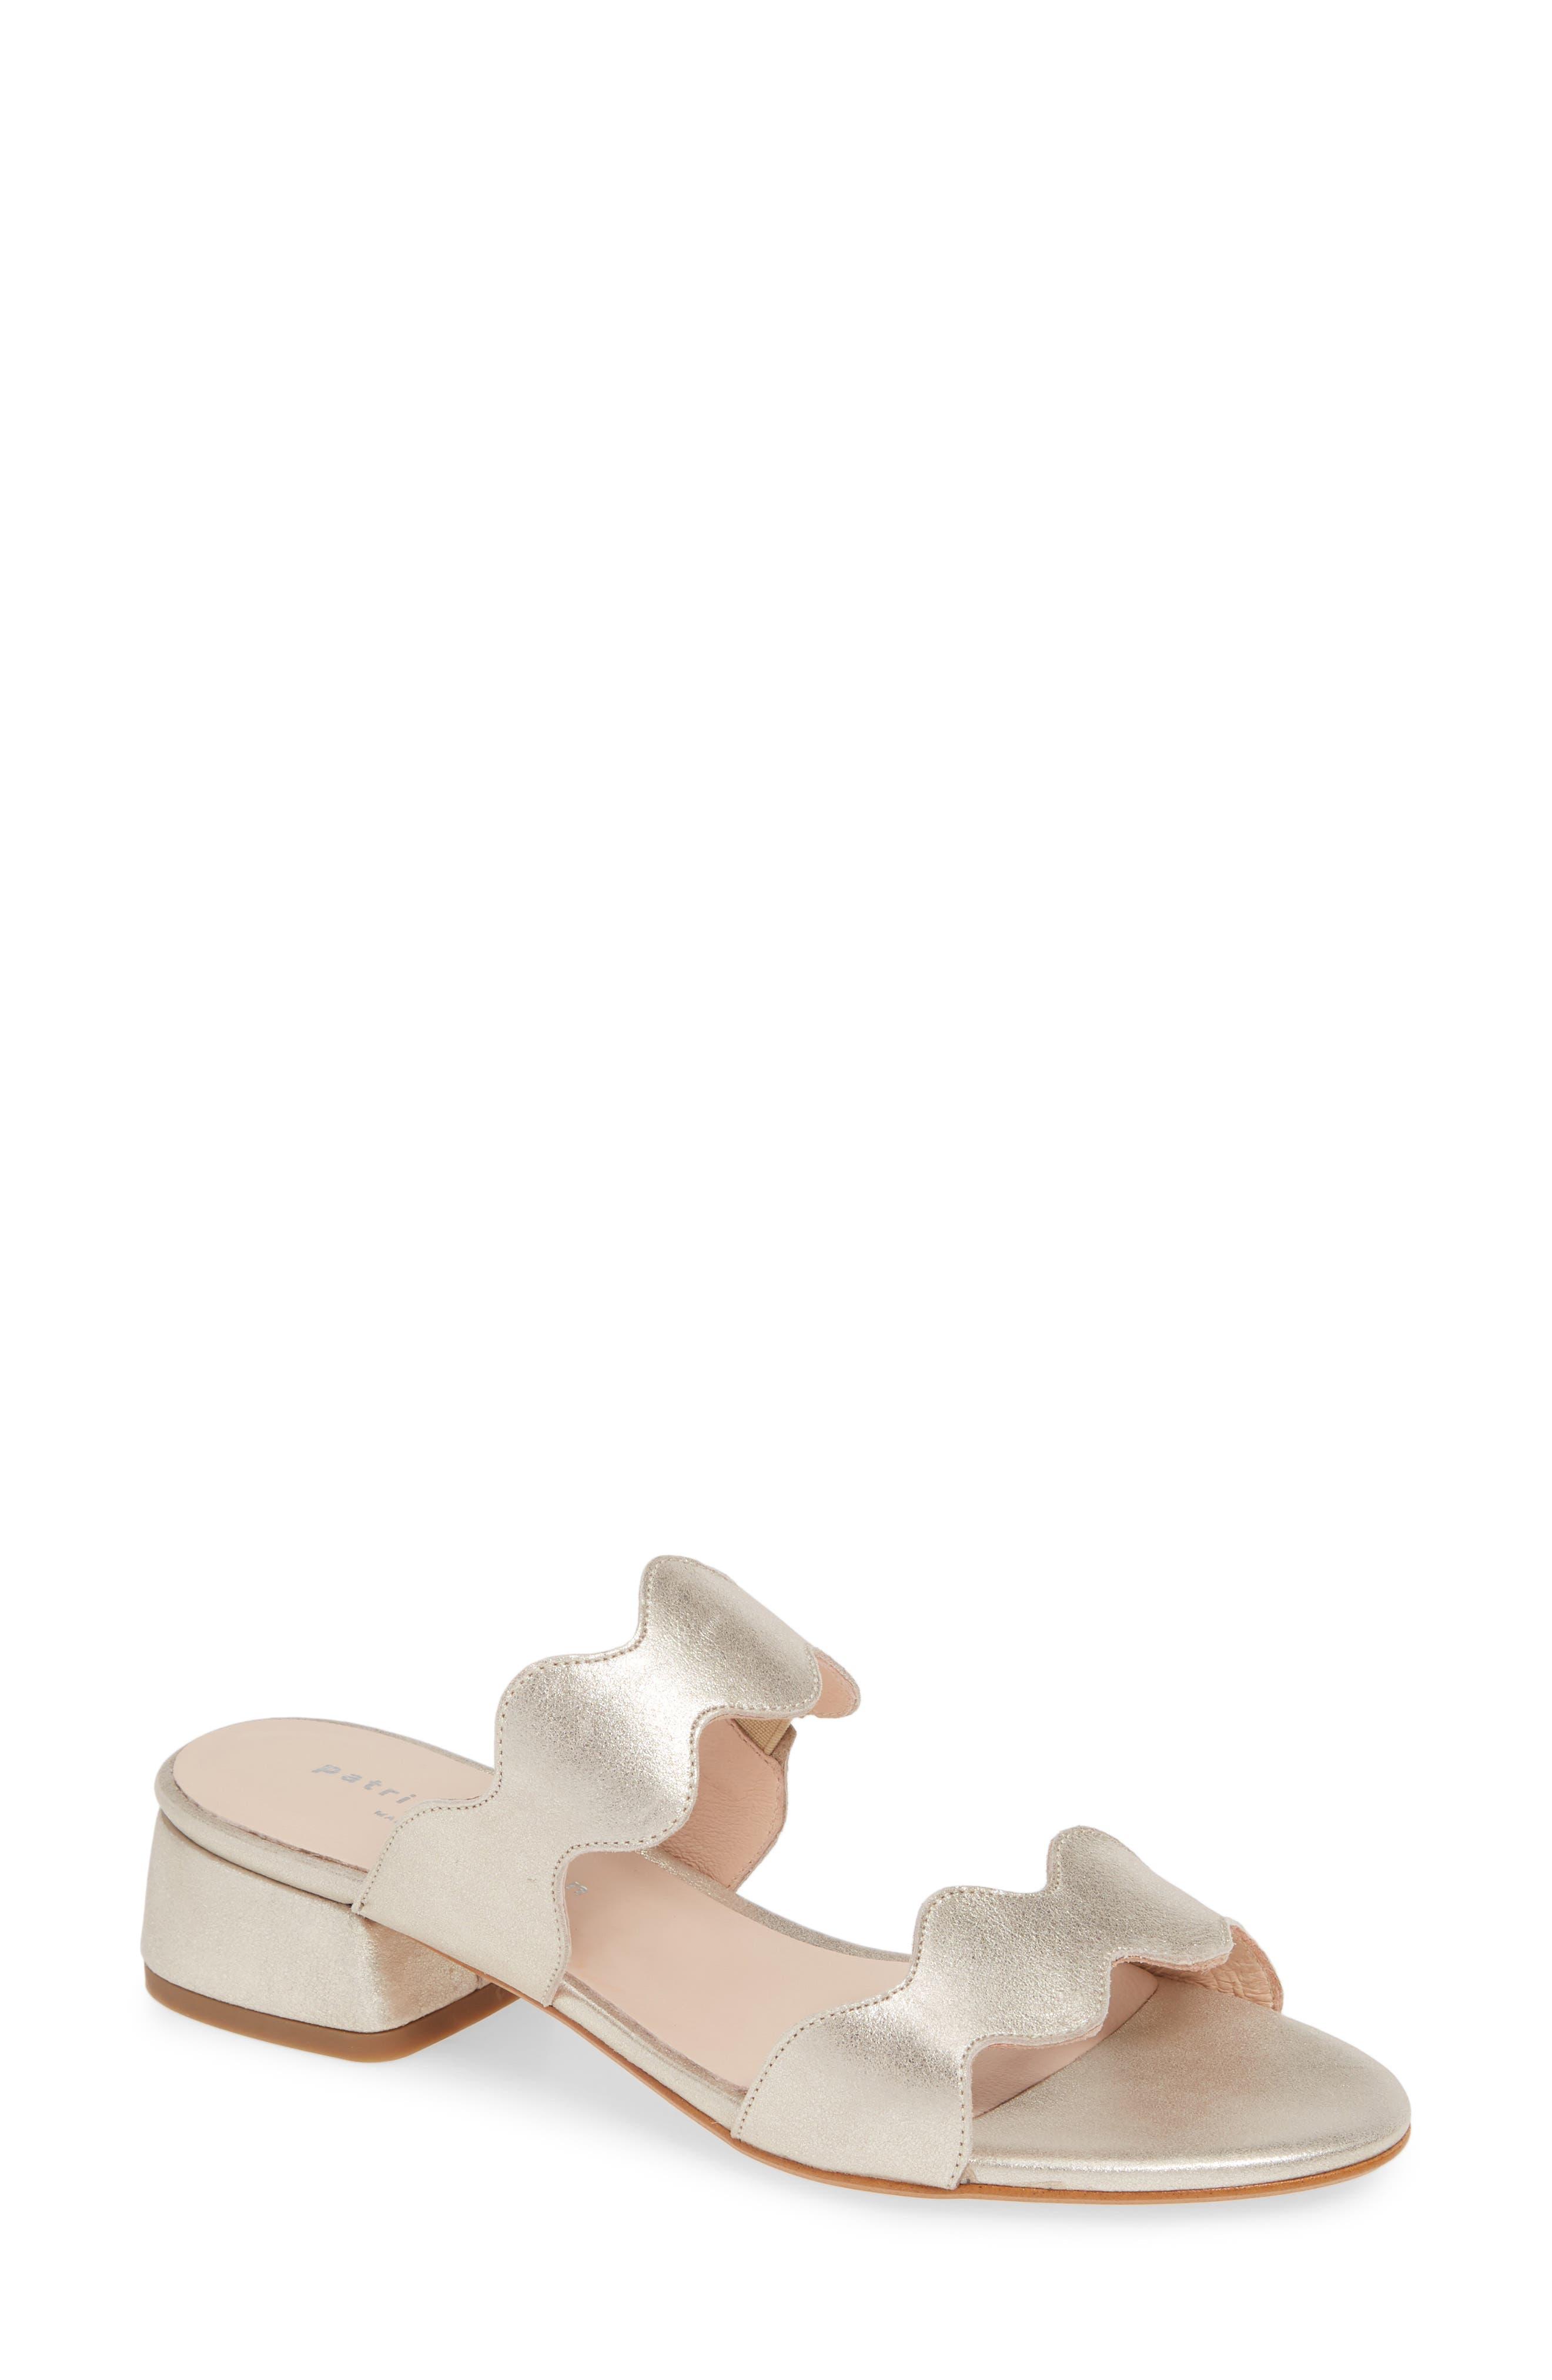 Patricia Green Bali Slide Sandal, Metallic